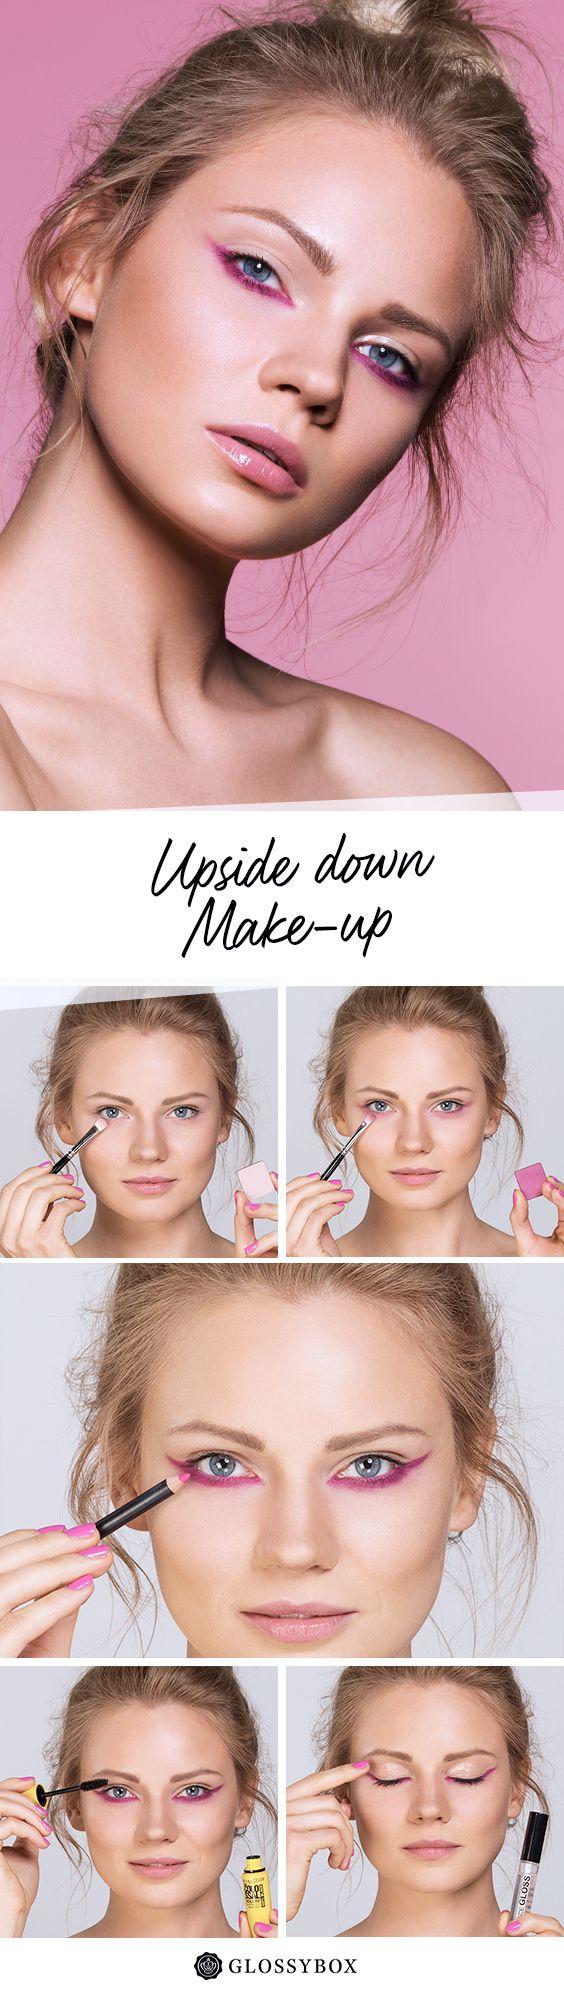 Pink, Upside Down, Make-up, Tutorial